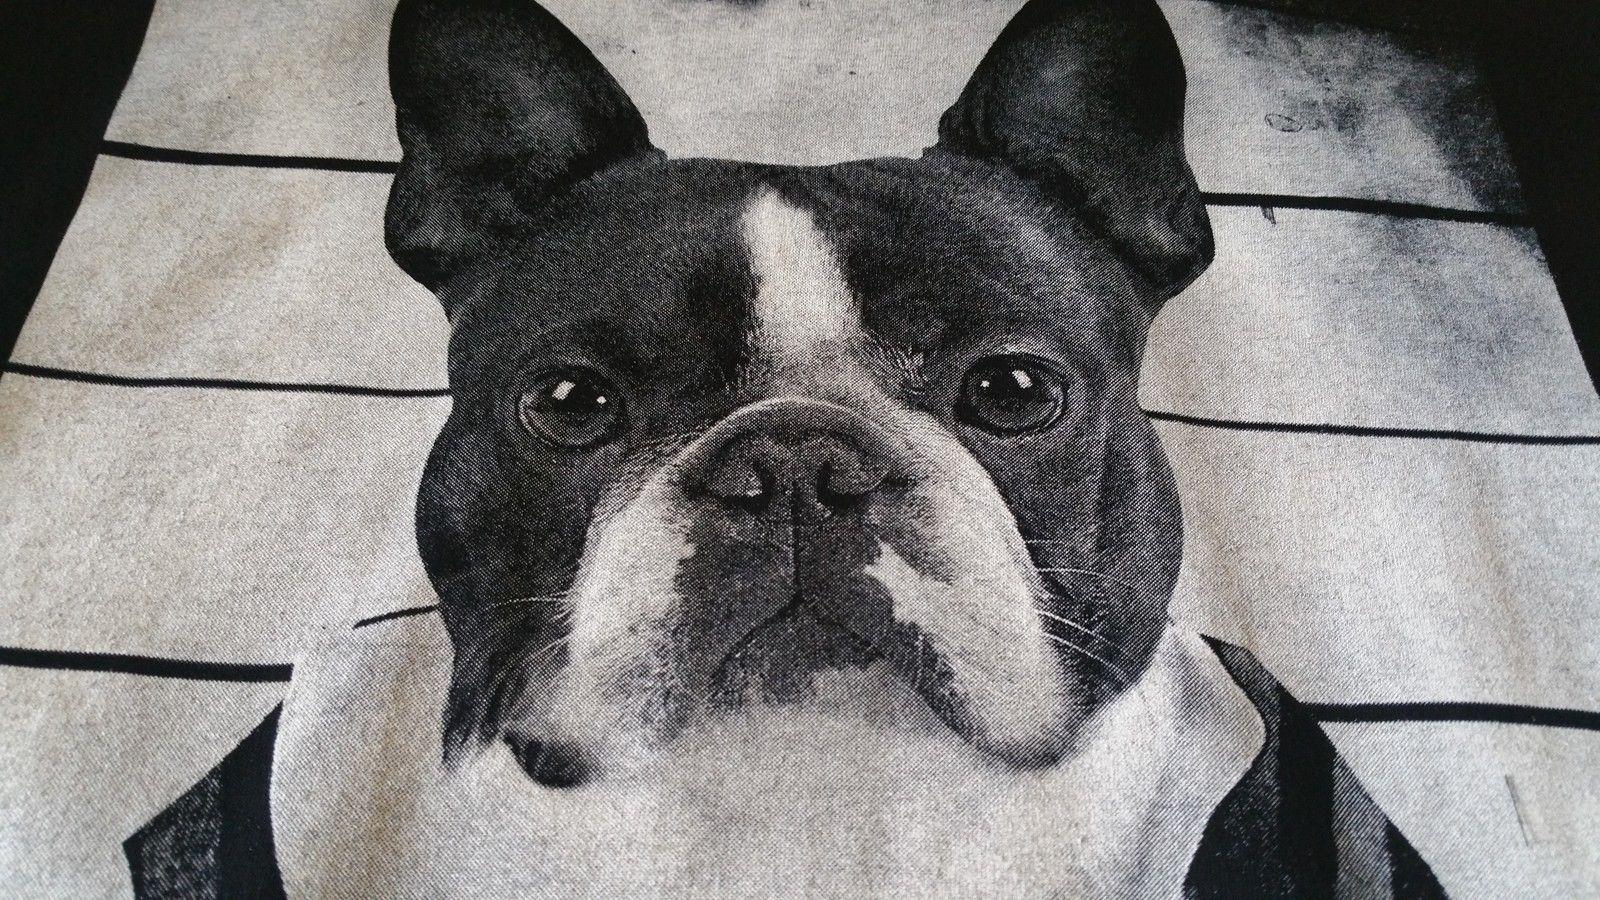 Bulldogge Mugshot T-Shirt Schwarz- Hund,Dog,French Bulldog,Frenchi T-Shirt Novelty Cool Tops MenS Short Sleeve T shirt